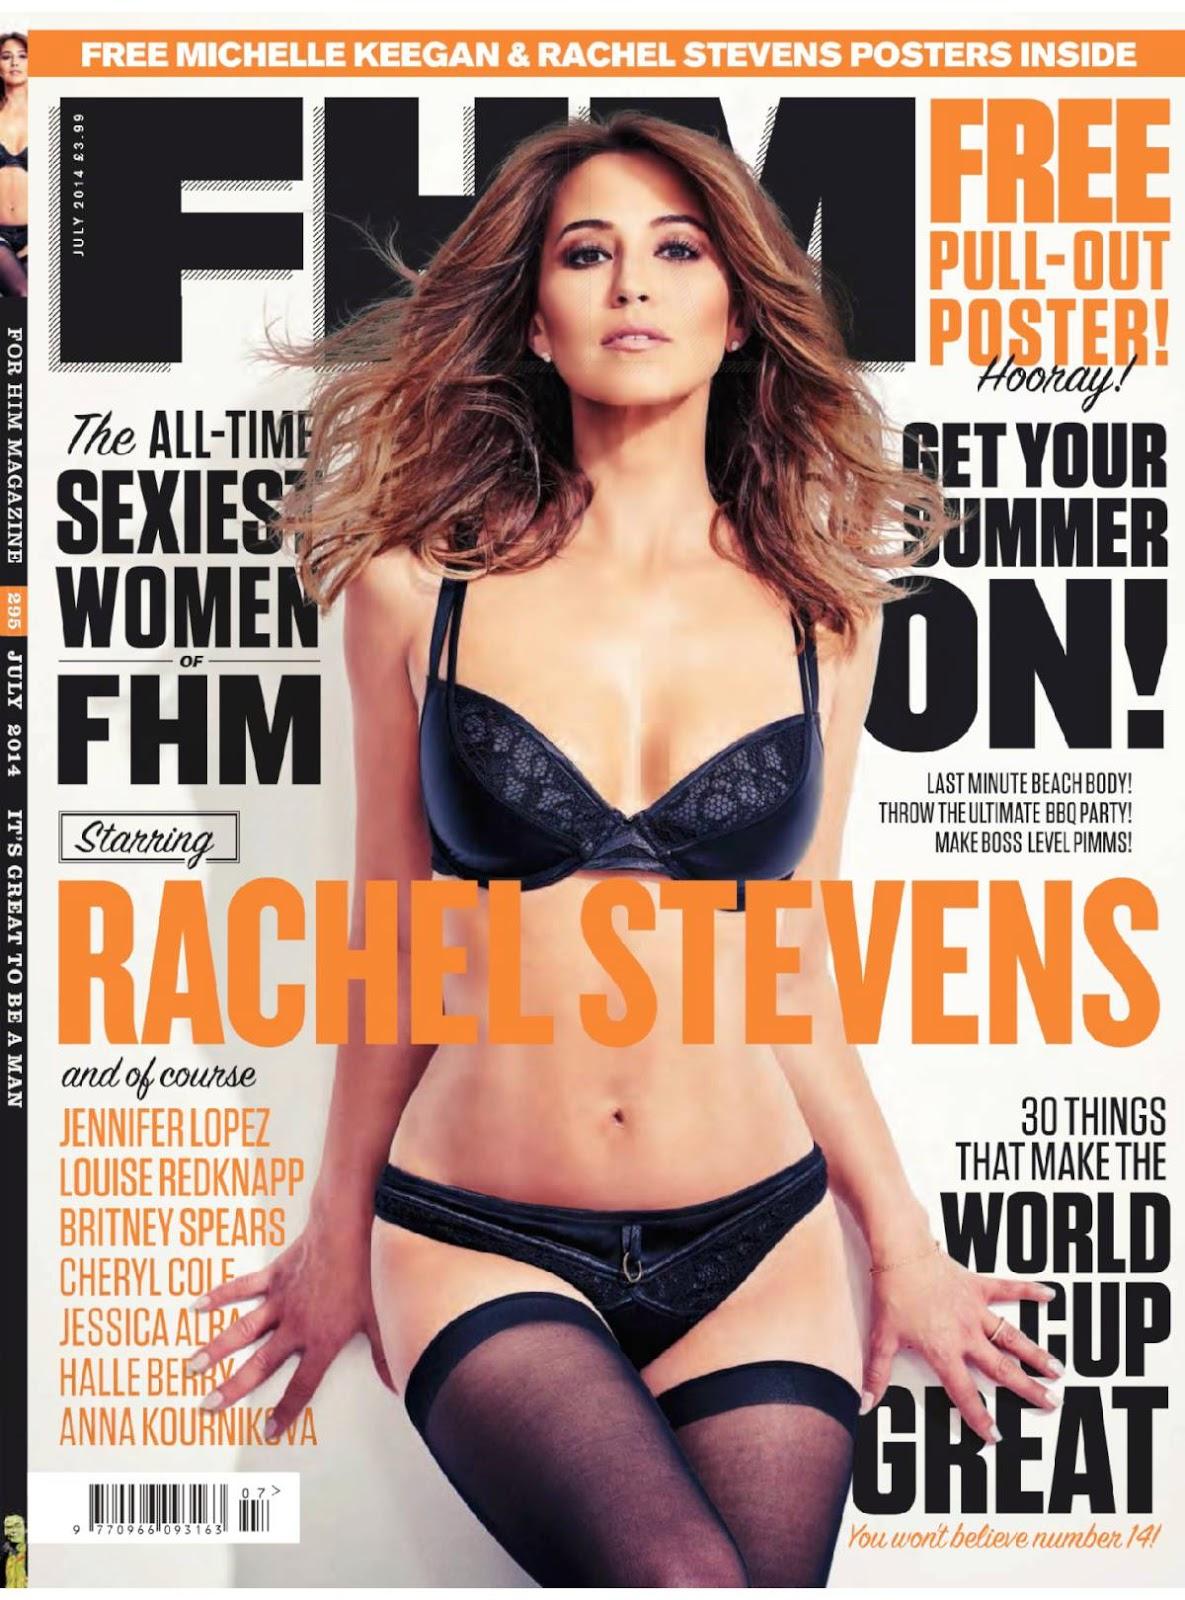 PhotoFunMasti: Rachel Stevens Hot Photoshoot For FHM